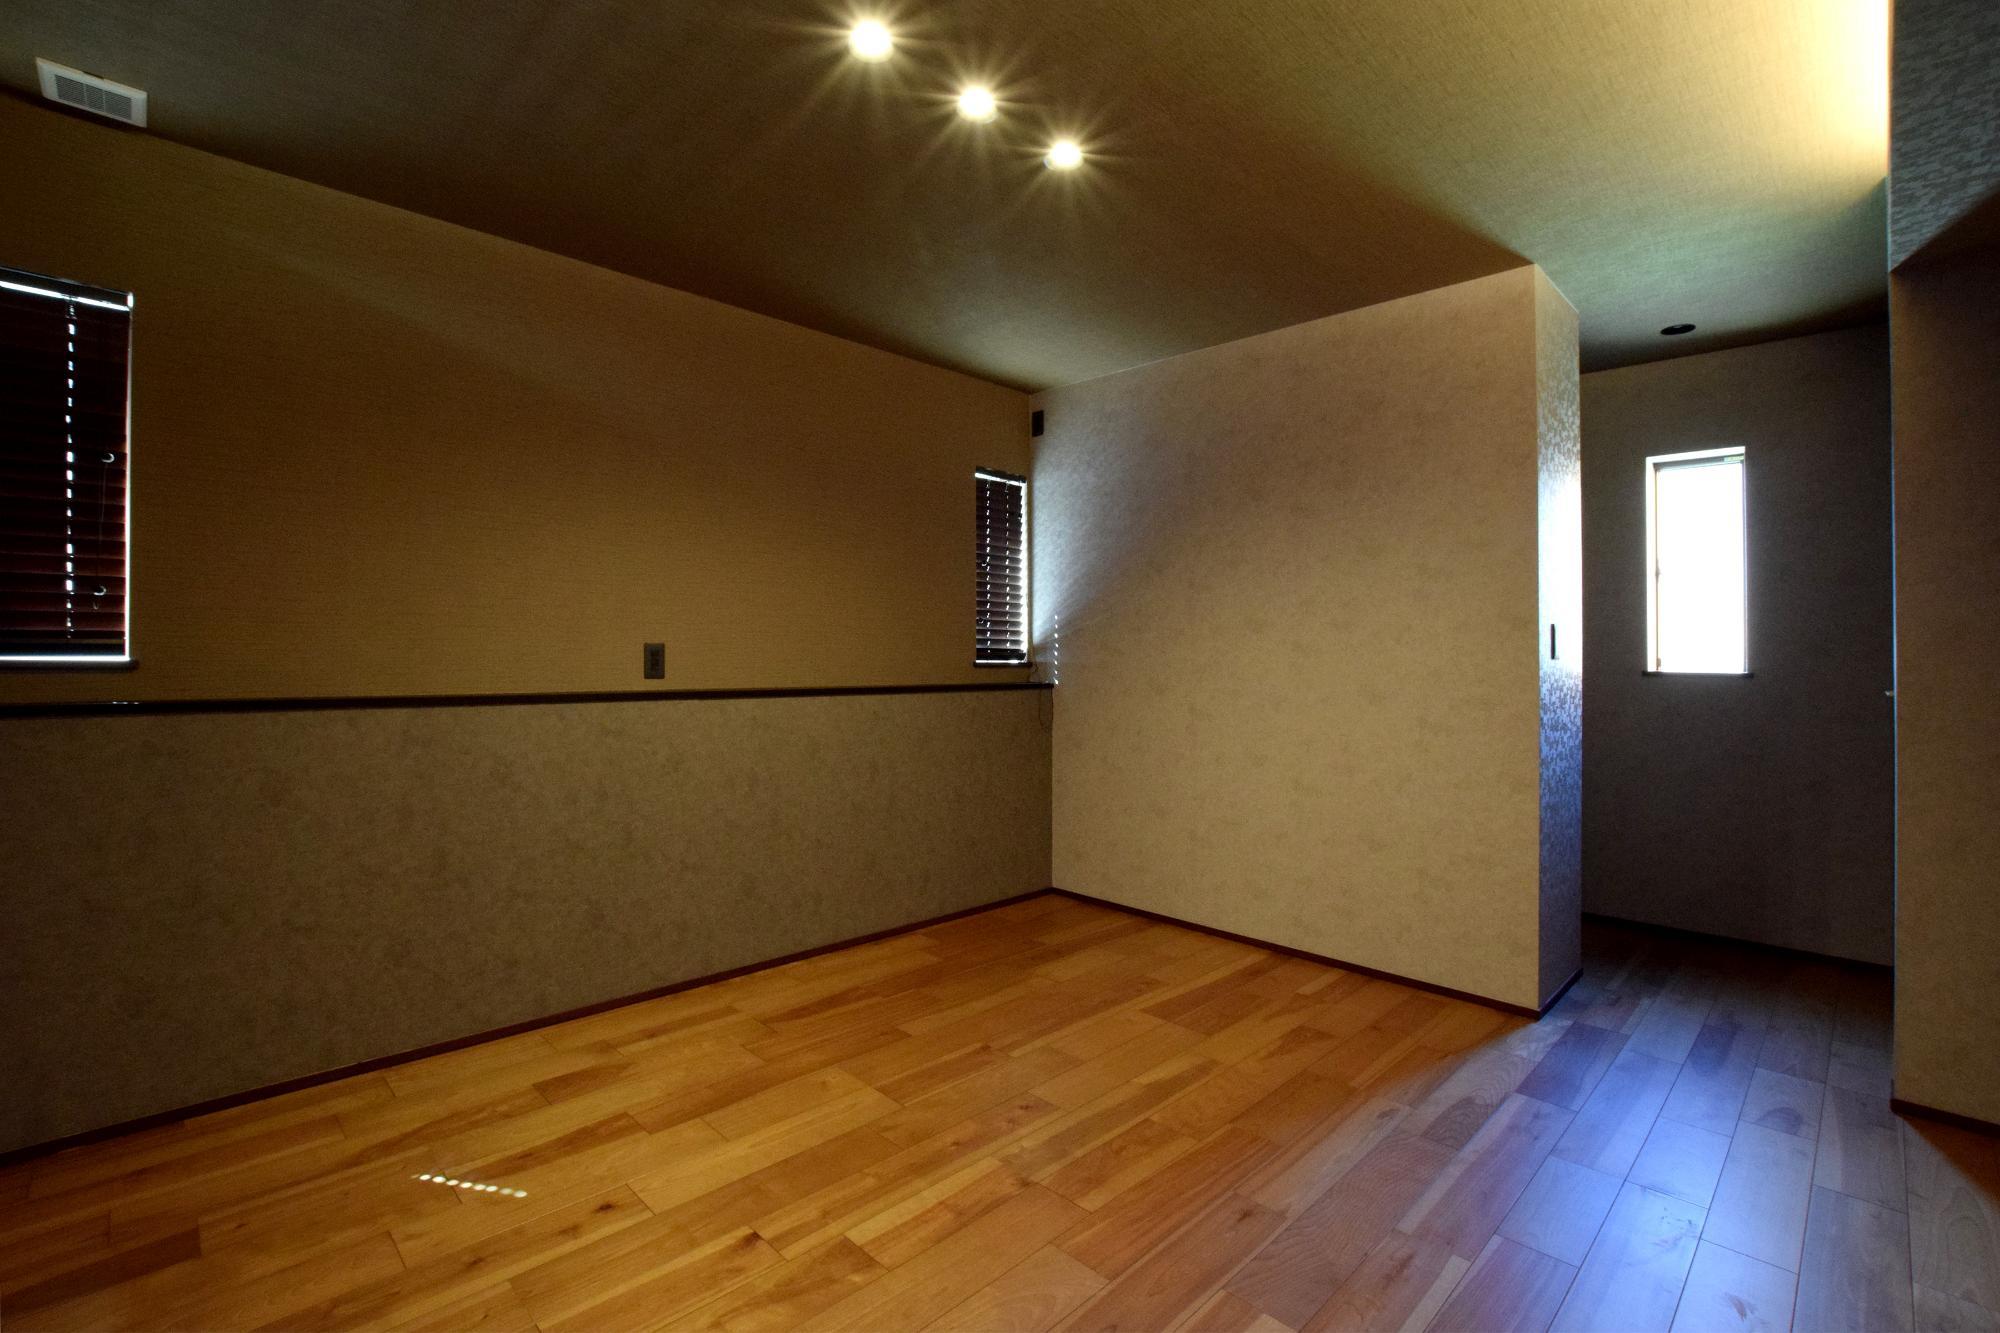 DETAIL HOME(ディテールホーム)「断熱材が2倍の全館空調の家」のシンプル・ナチュラル・モダンな居室の実例写真